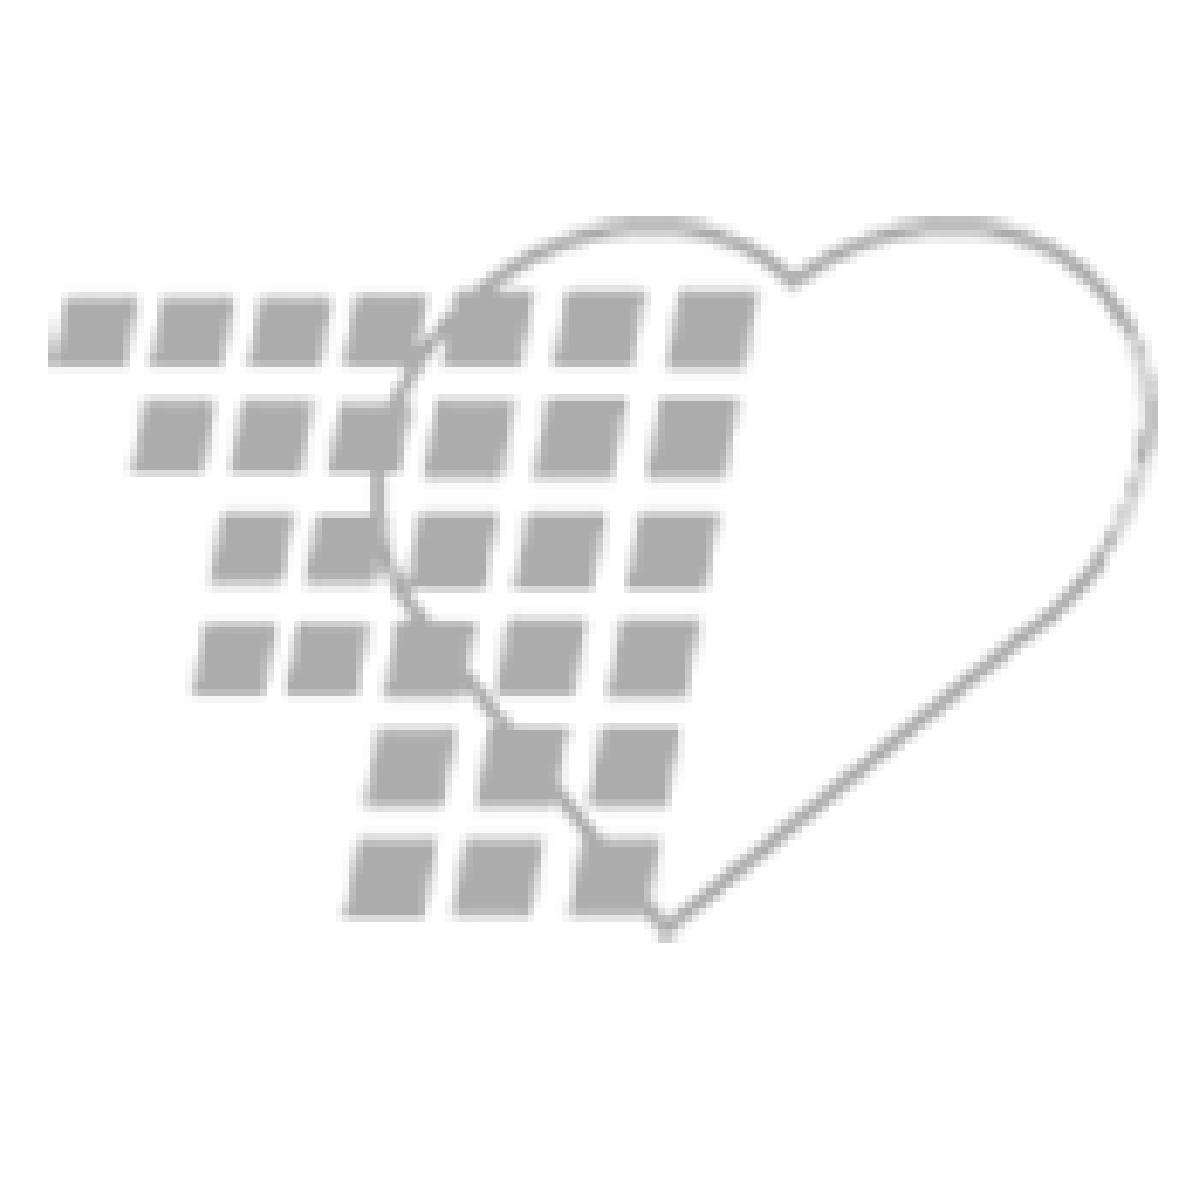 05-44-0600 - Laerdal Stifneck® Tall Collar Adult